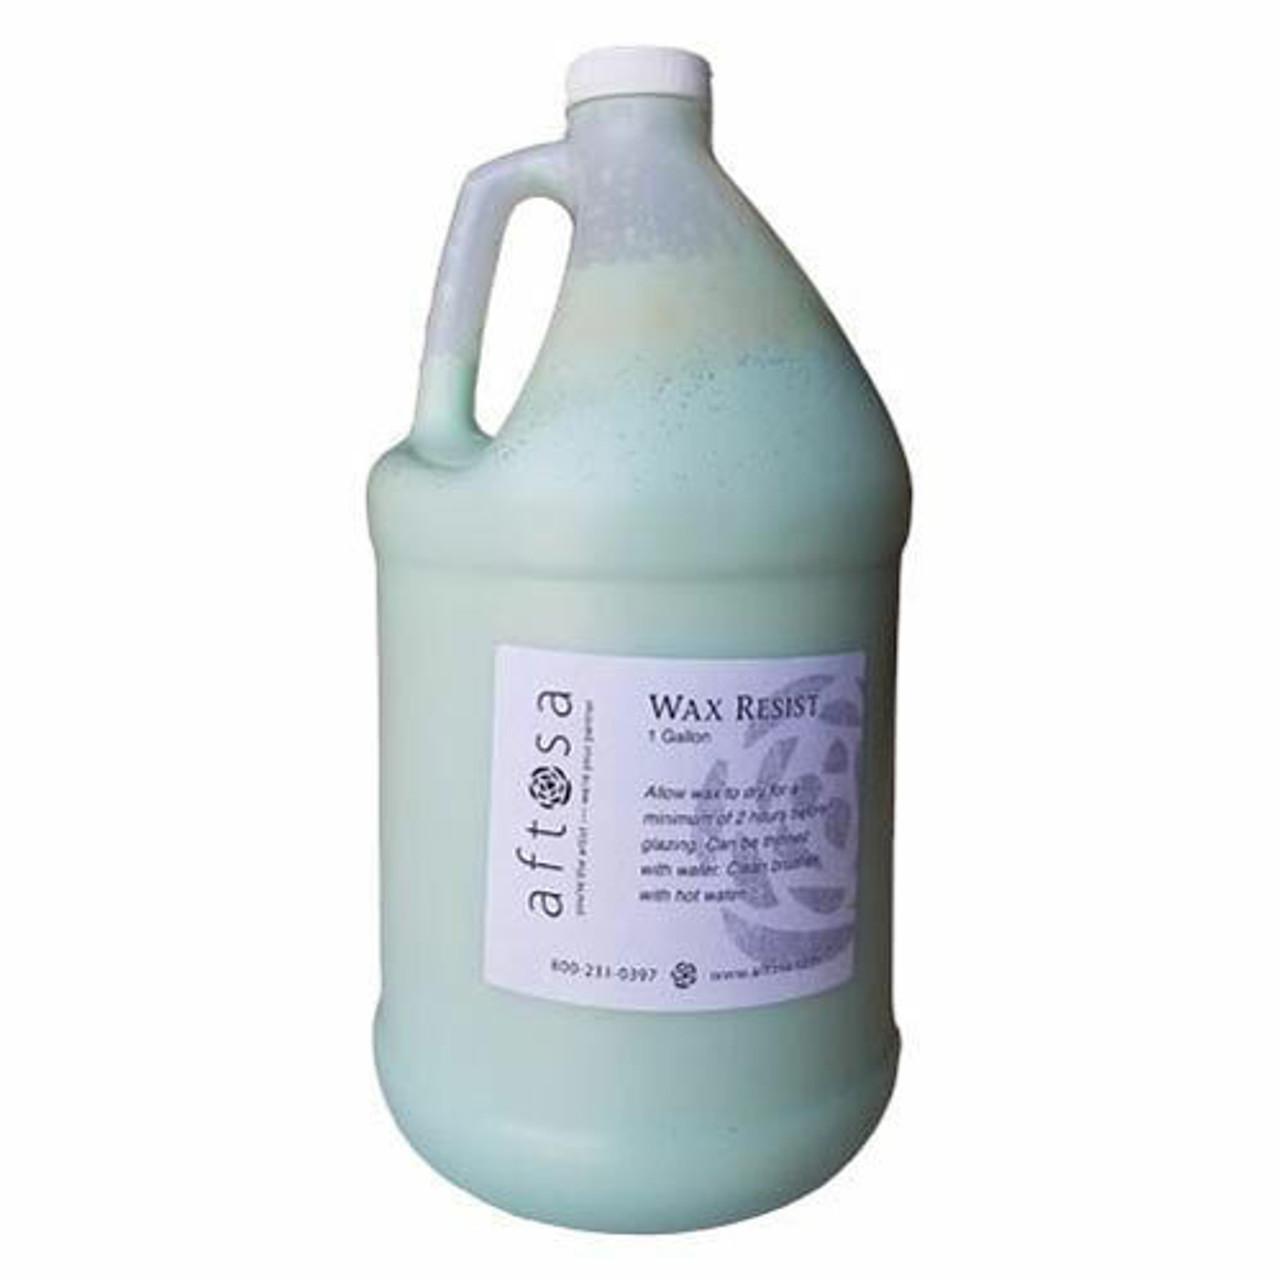 128 ounce (1 gallon) wax resist from AFTOSA